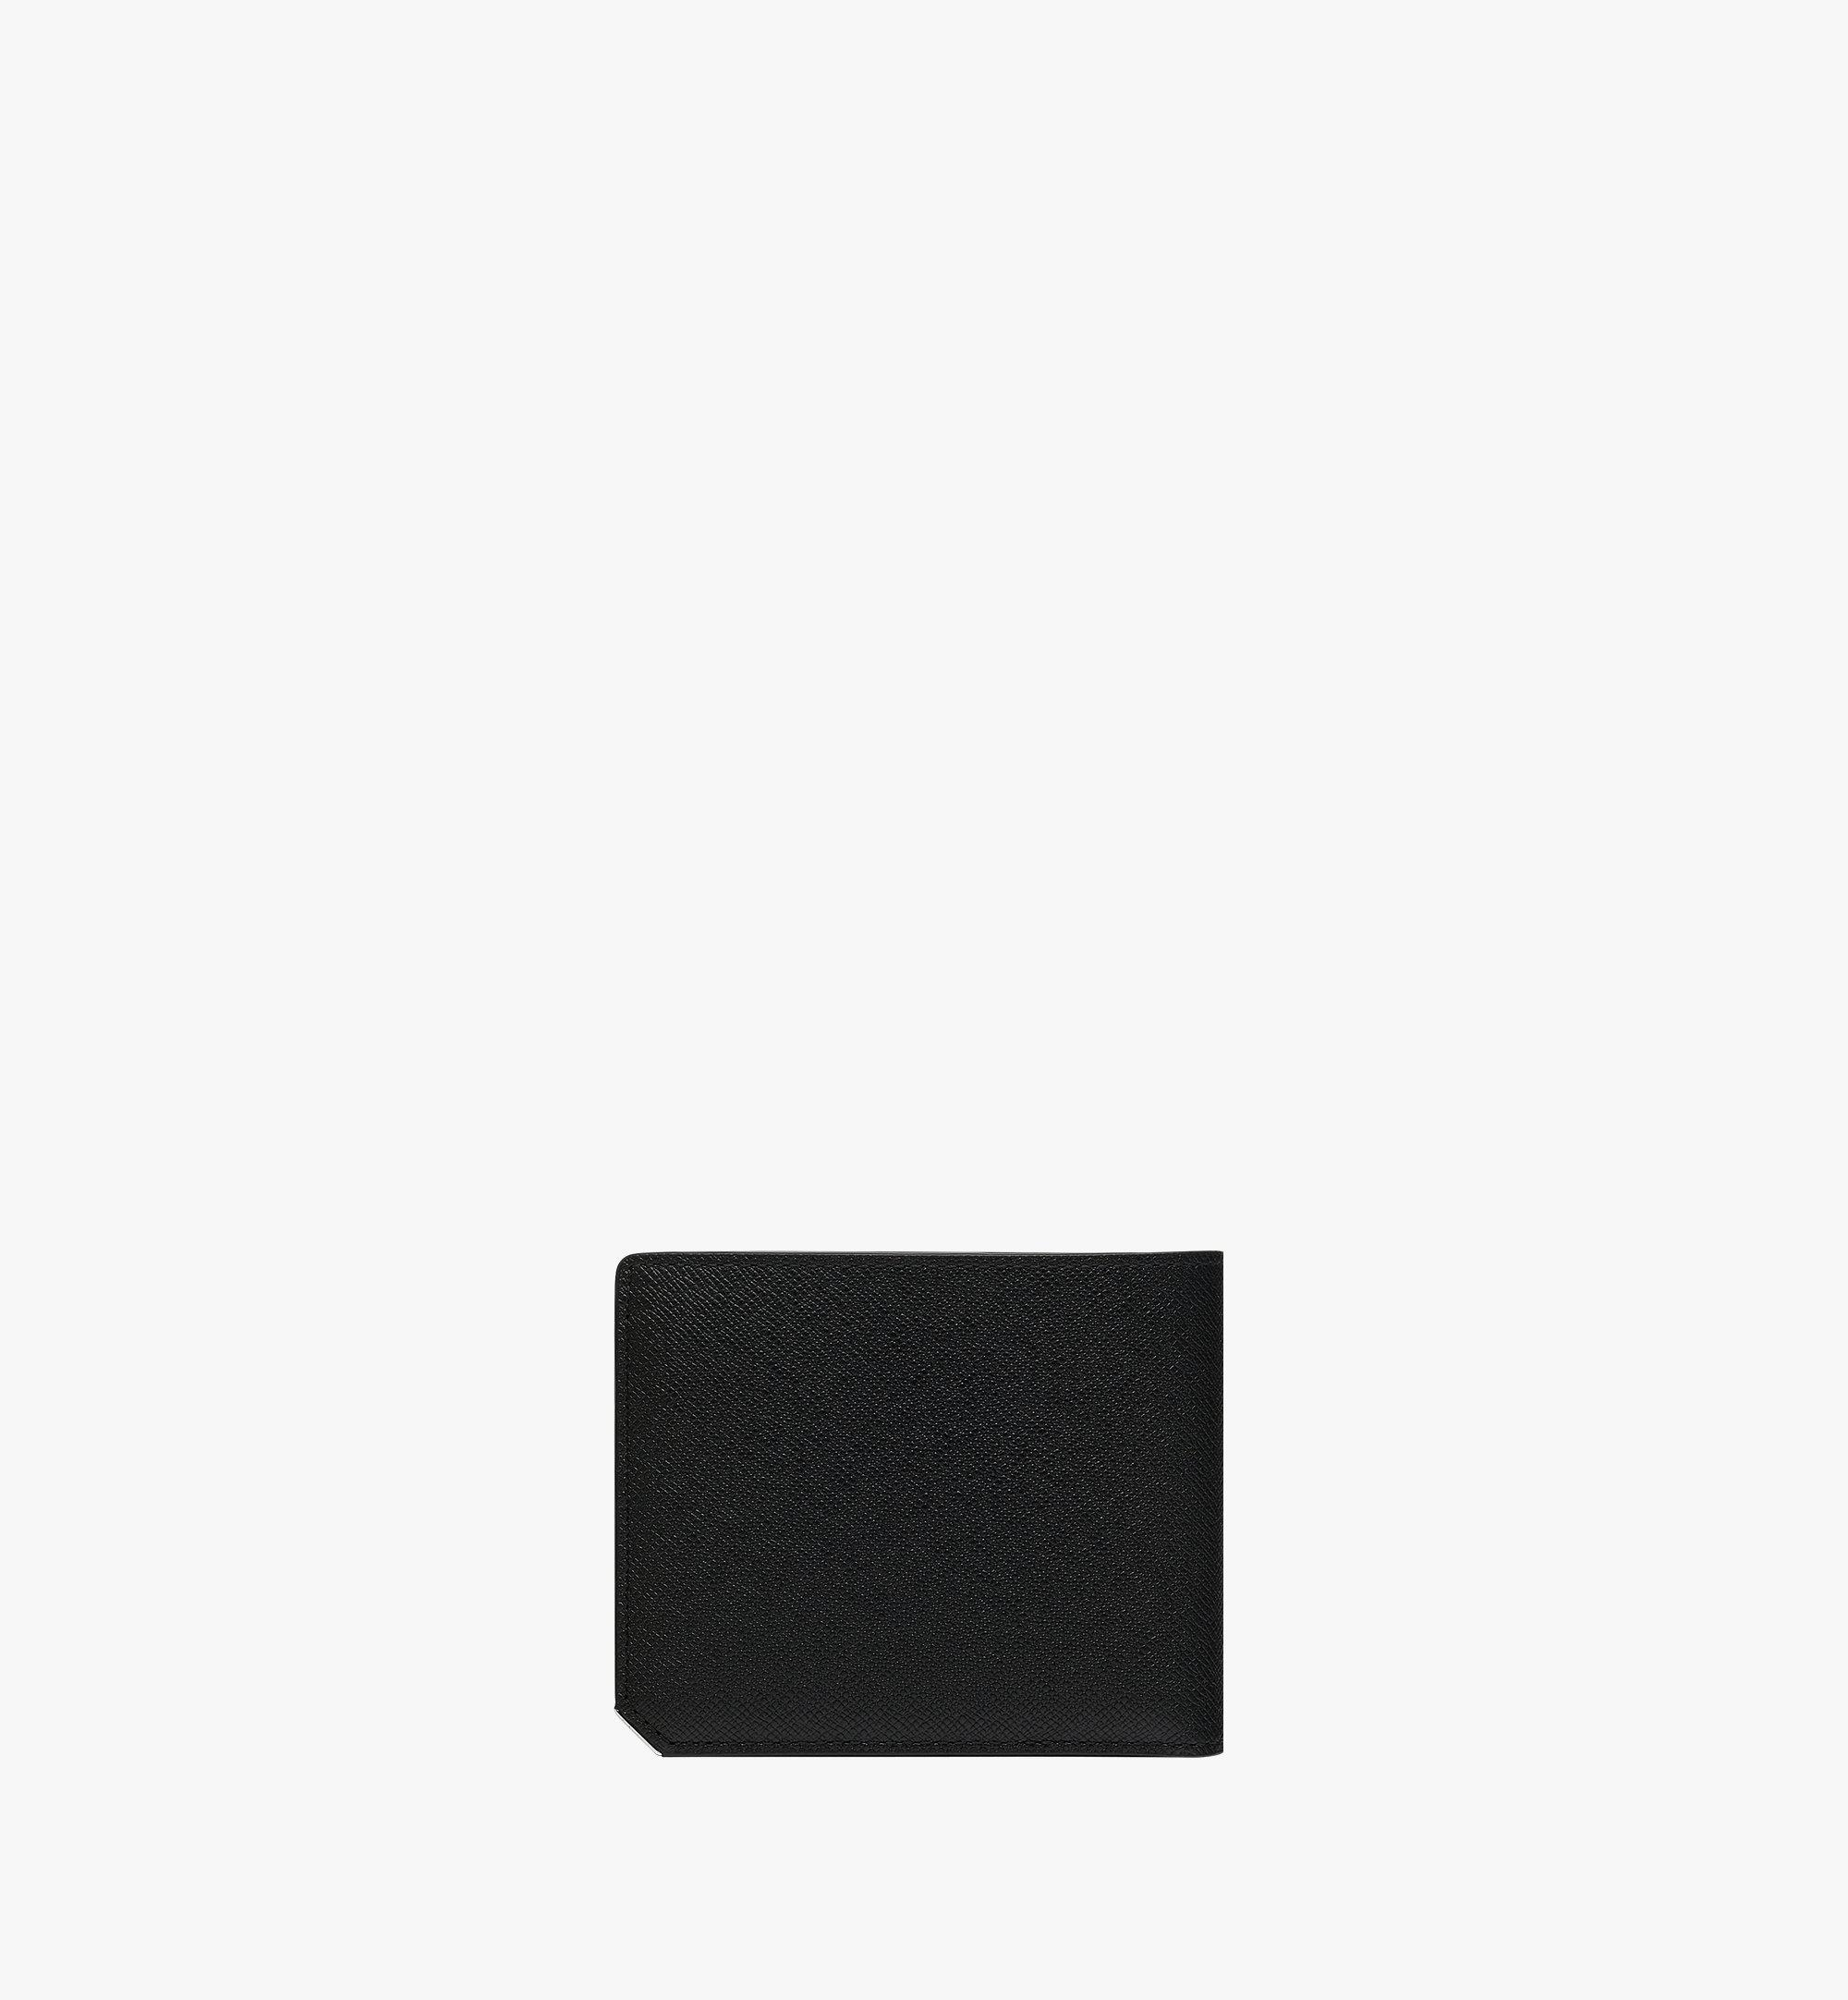 MCM 뉴브릭 엠보싱 레더 카드케이스 2단 지갑 Black MXS8ALL52BK001 Alternate View 3